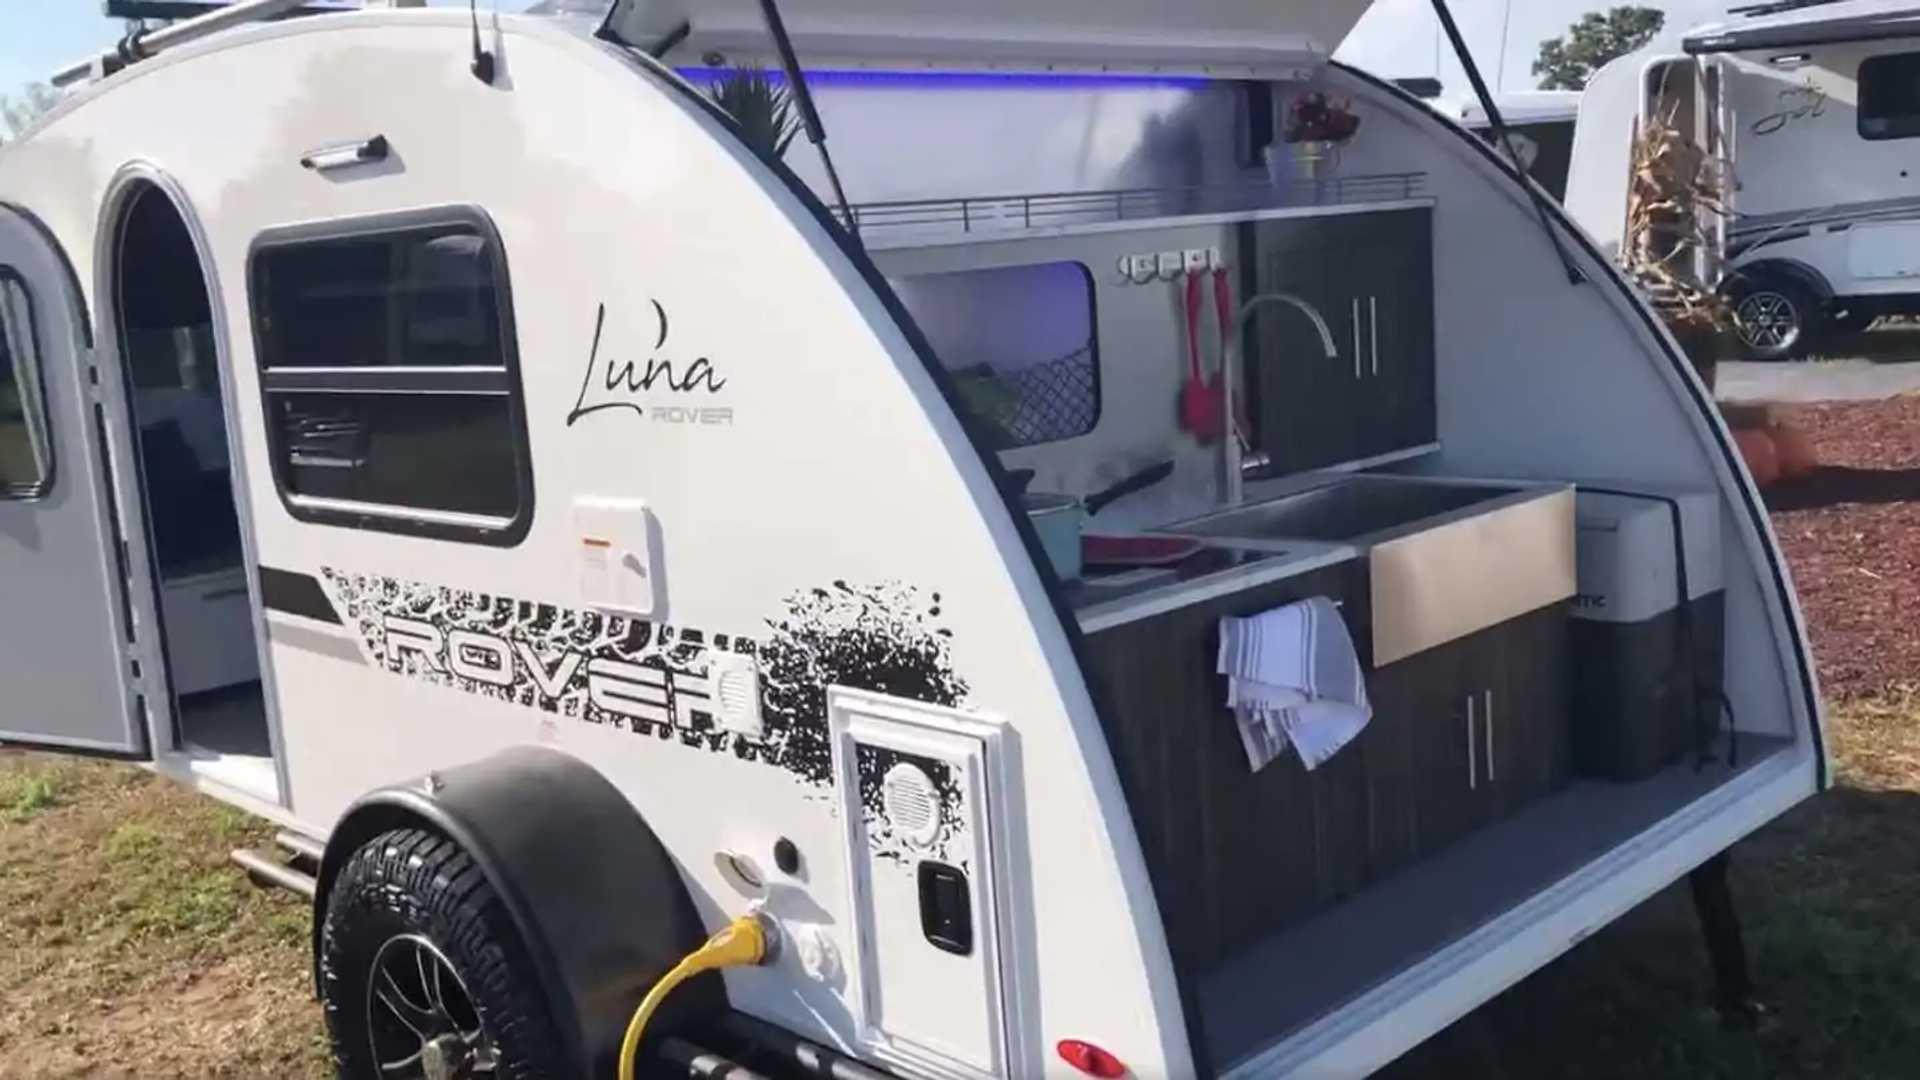 Small InTech Luna Rover Teardrop Trailer Packs Toilet, Fire Place on